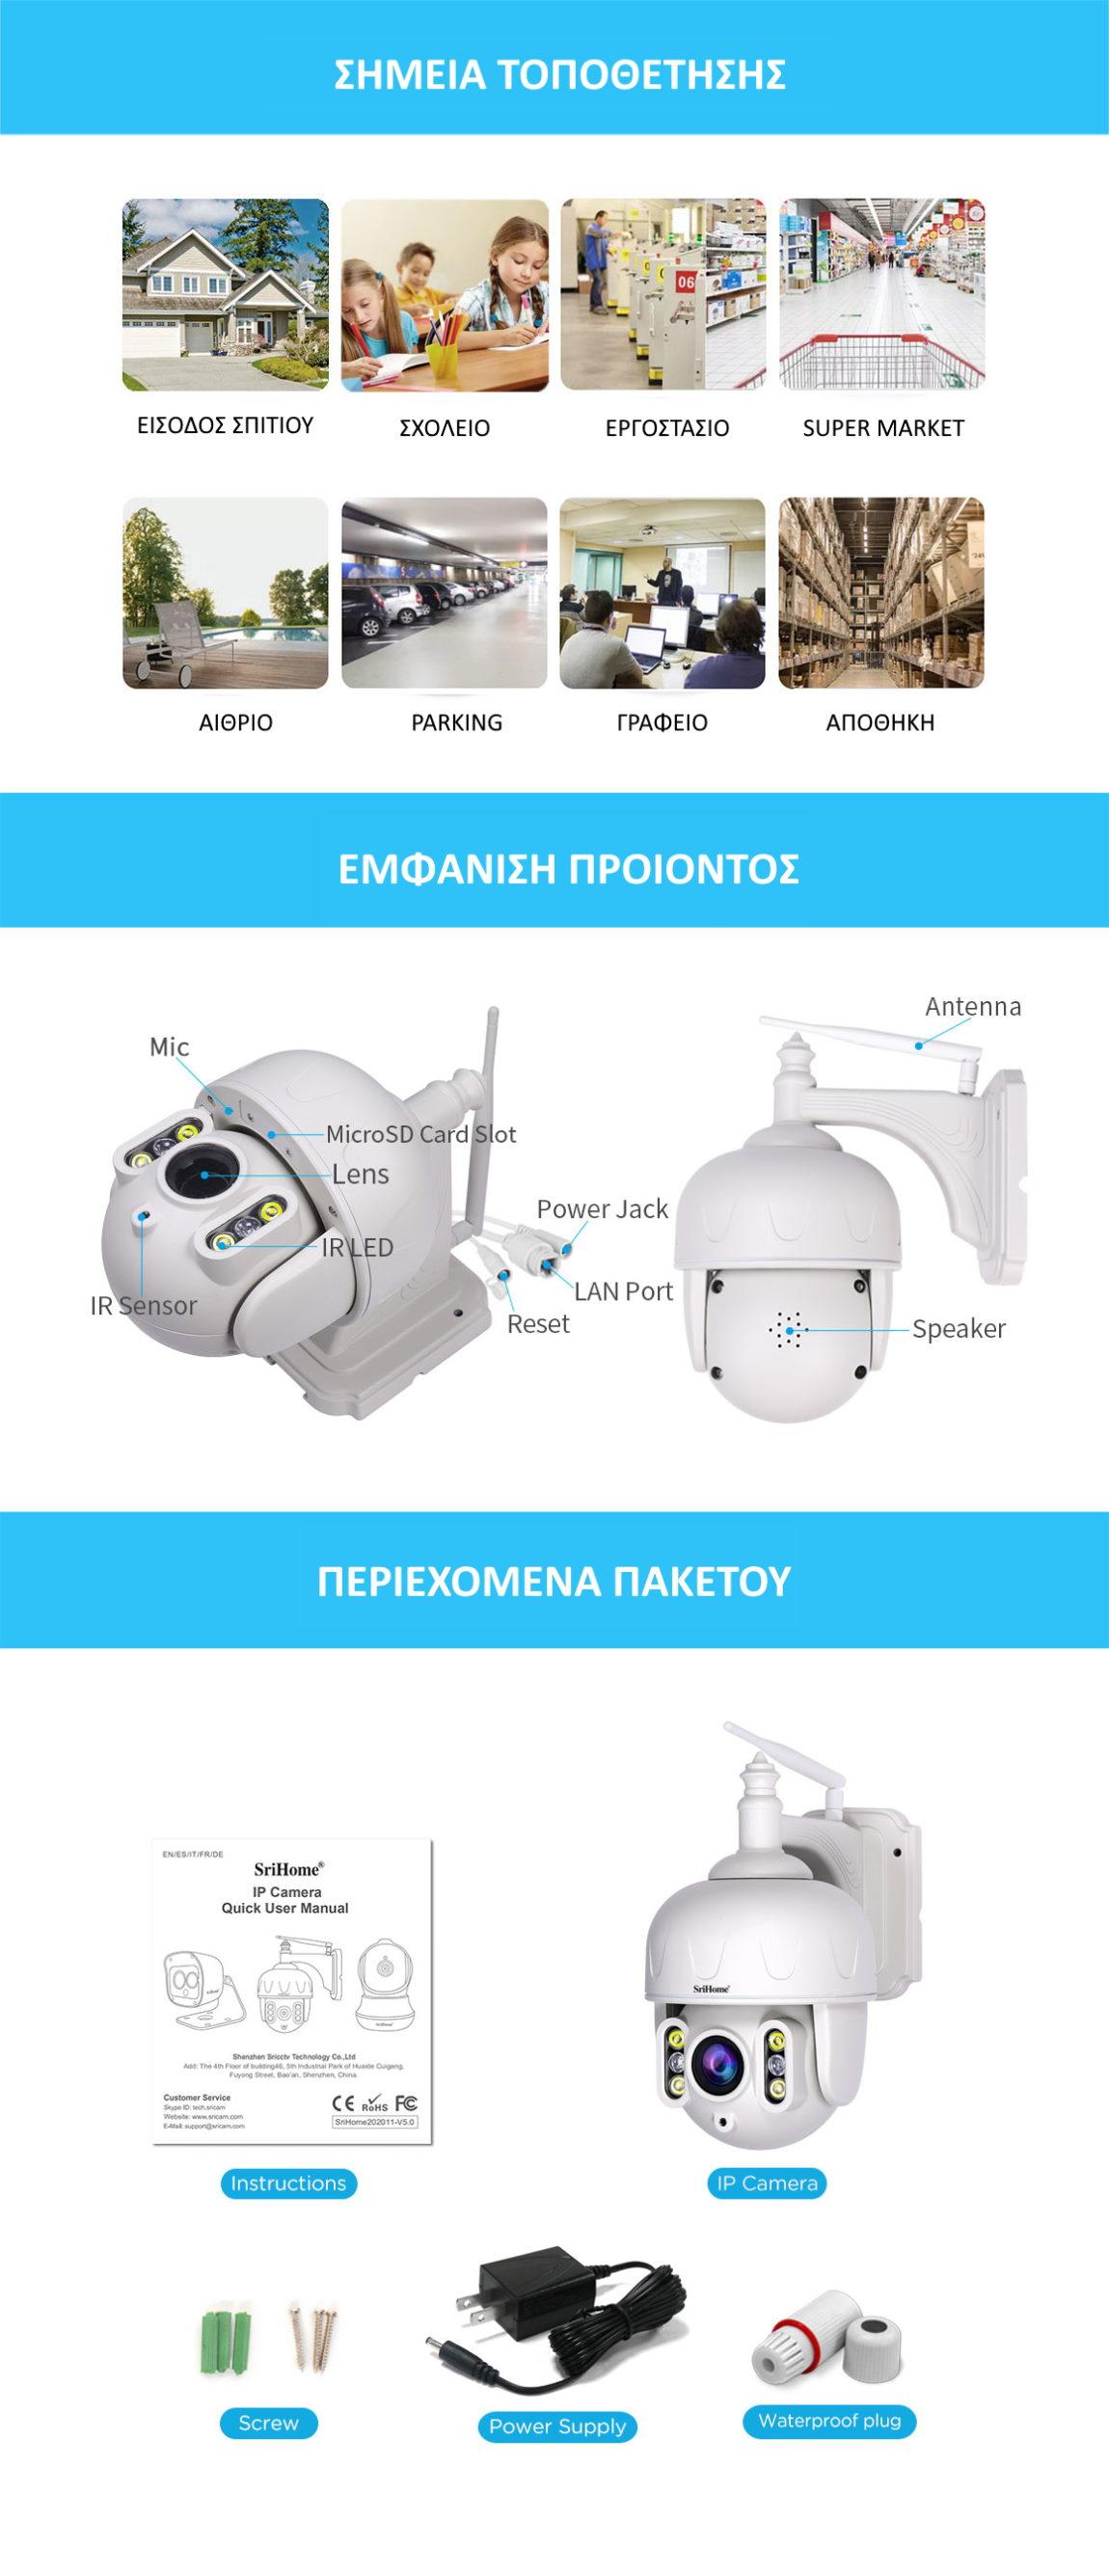 Srihome SH028 Κάμερα Ασφαλείας σημεία τοποθέτησης και περιεχόμενα πακέτου